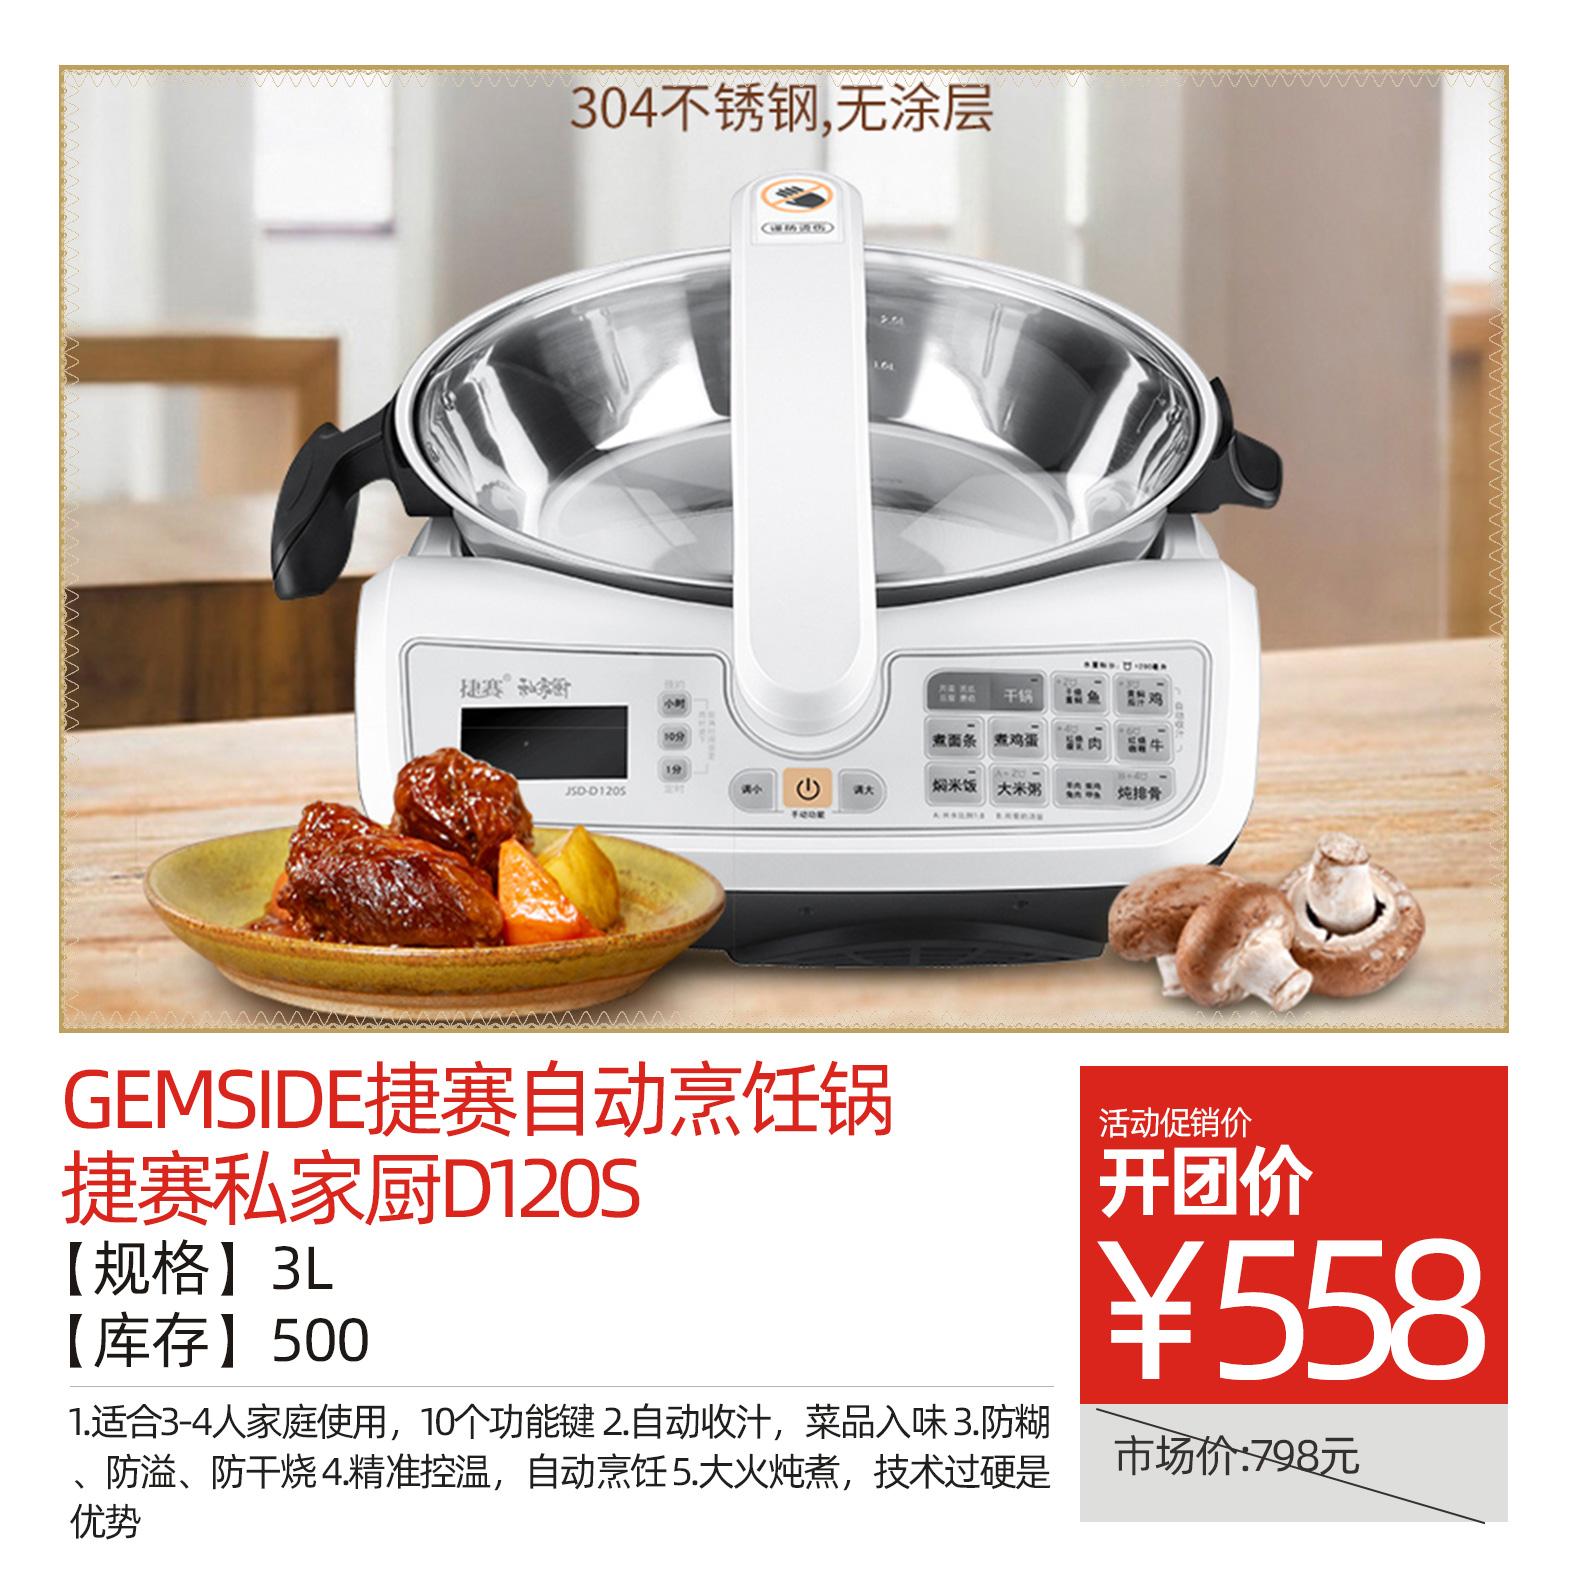 Gemside捷赛自动烹饪锅捷赛私家厨D120S